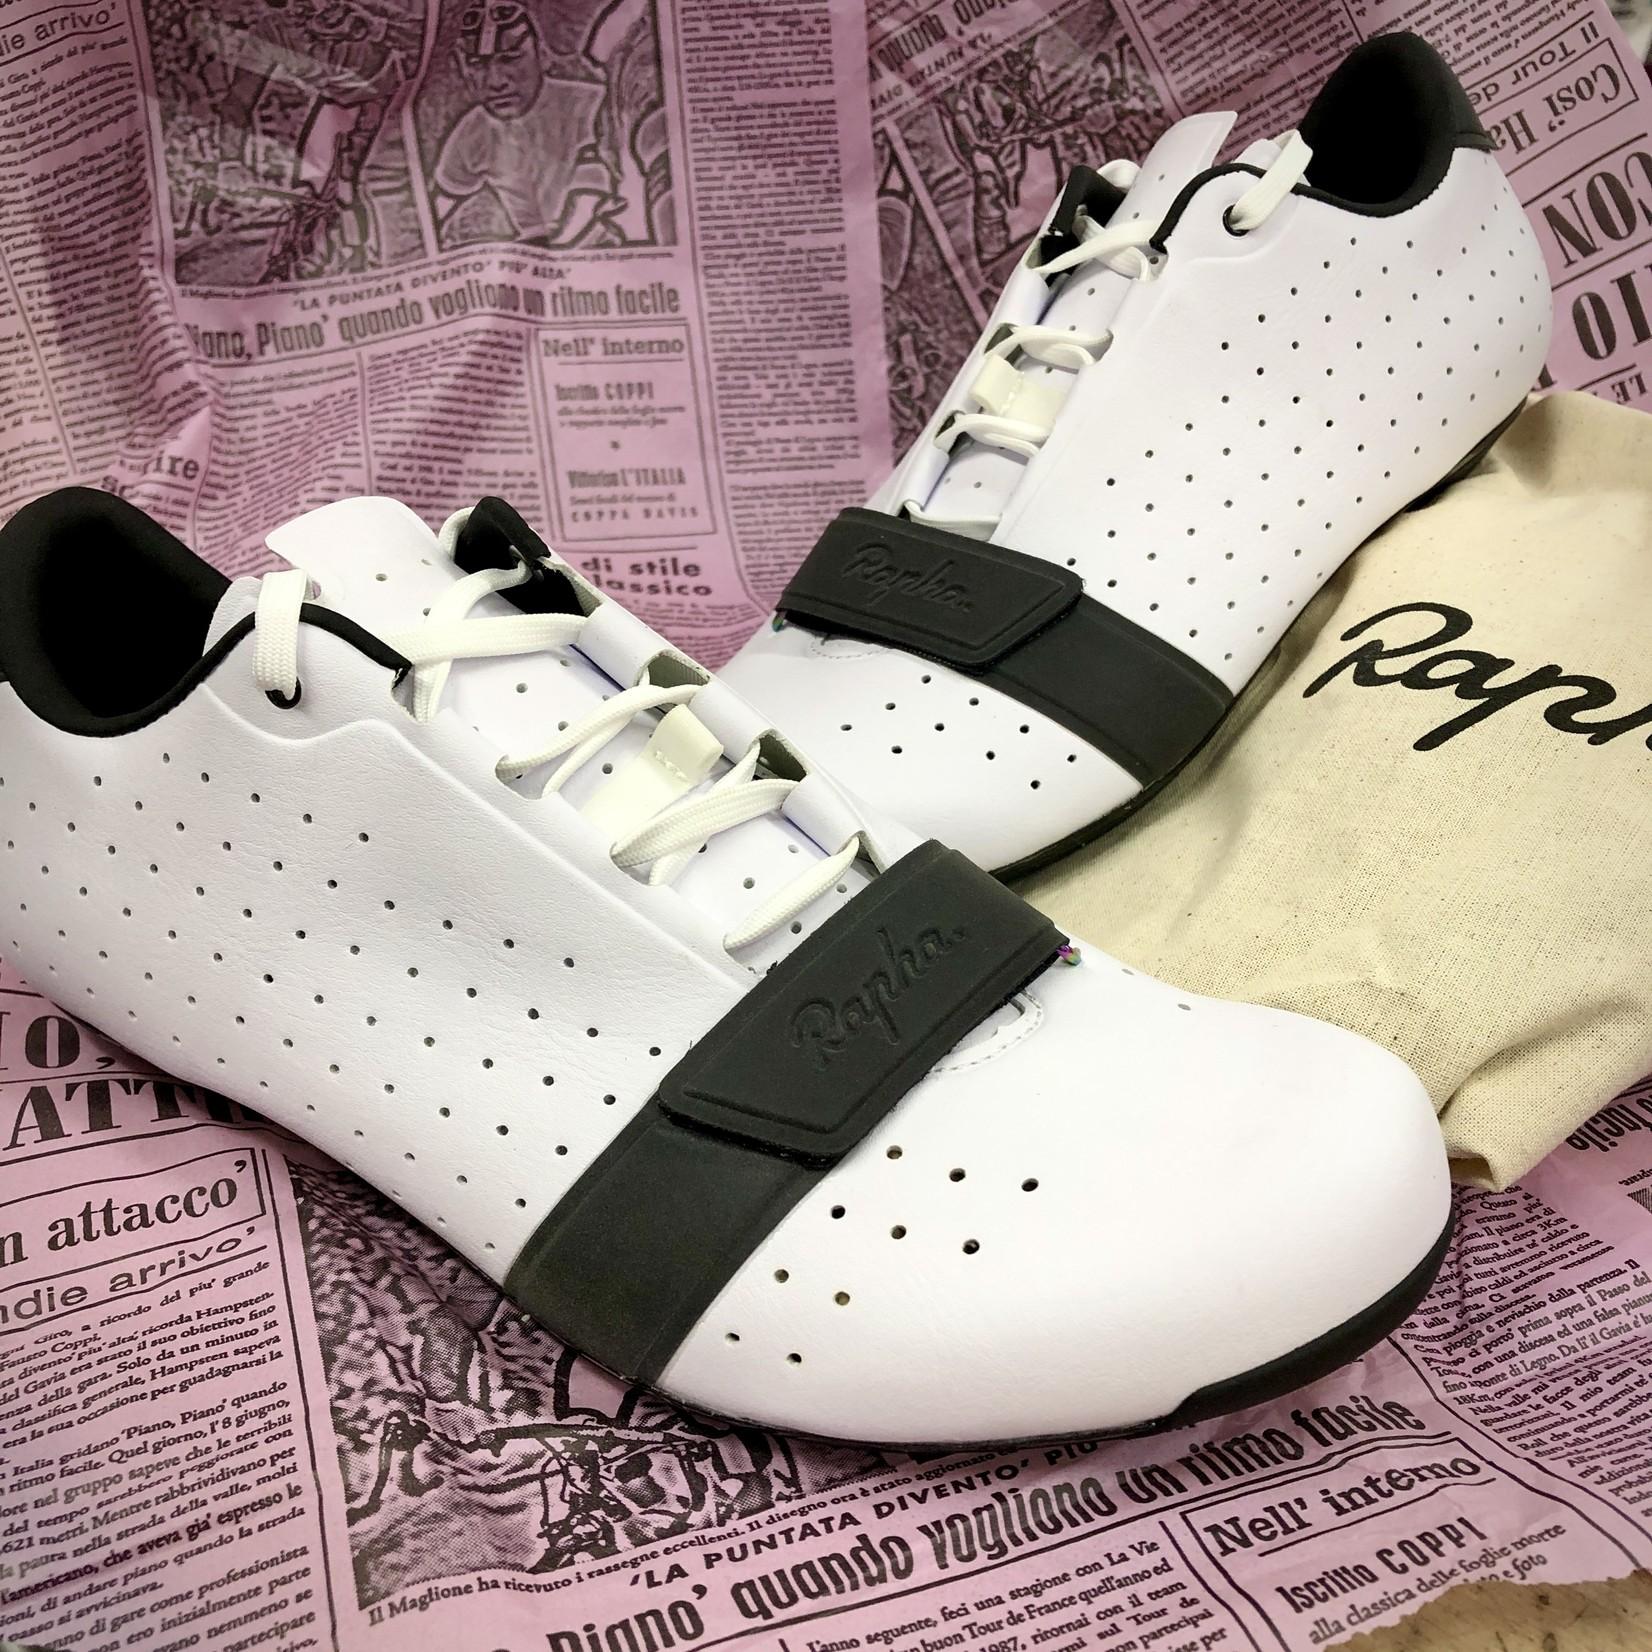 Rapha Rapha Classic Shoes